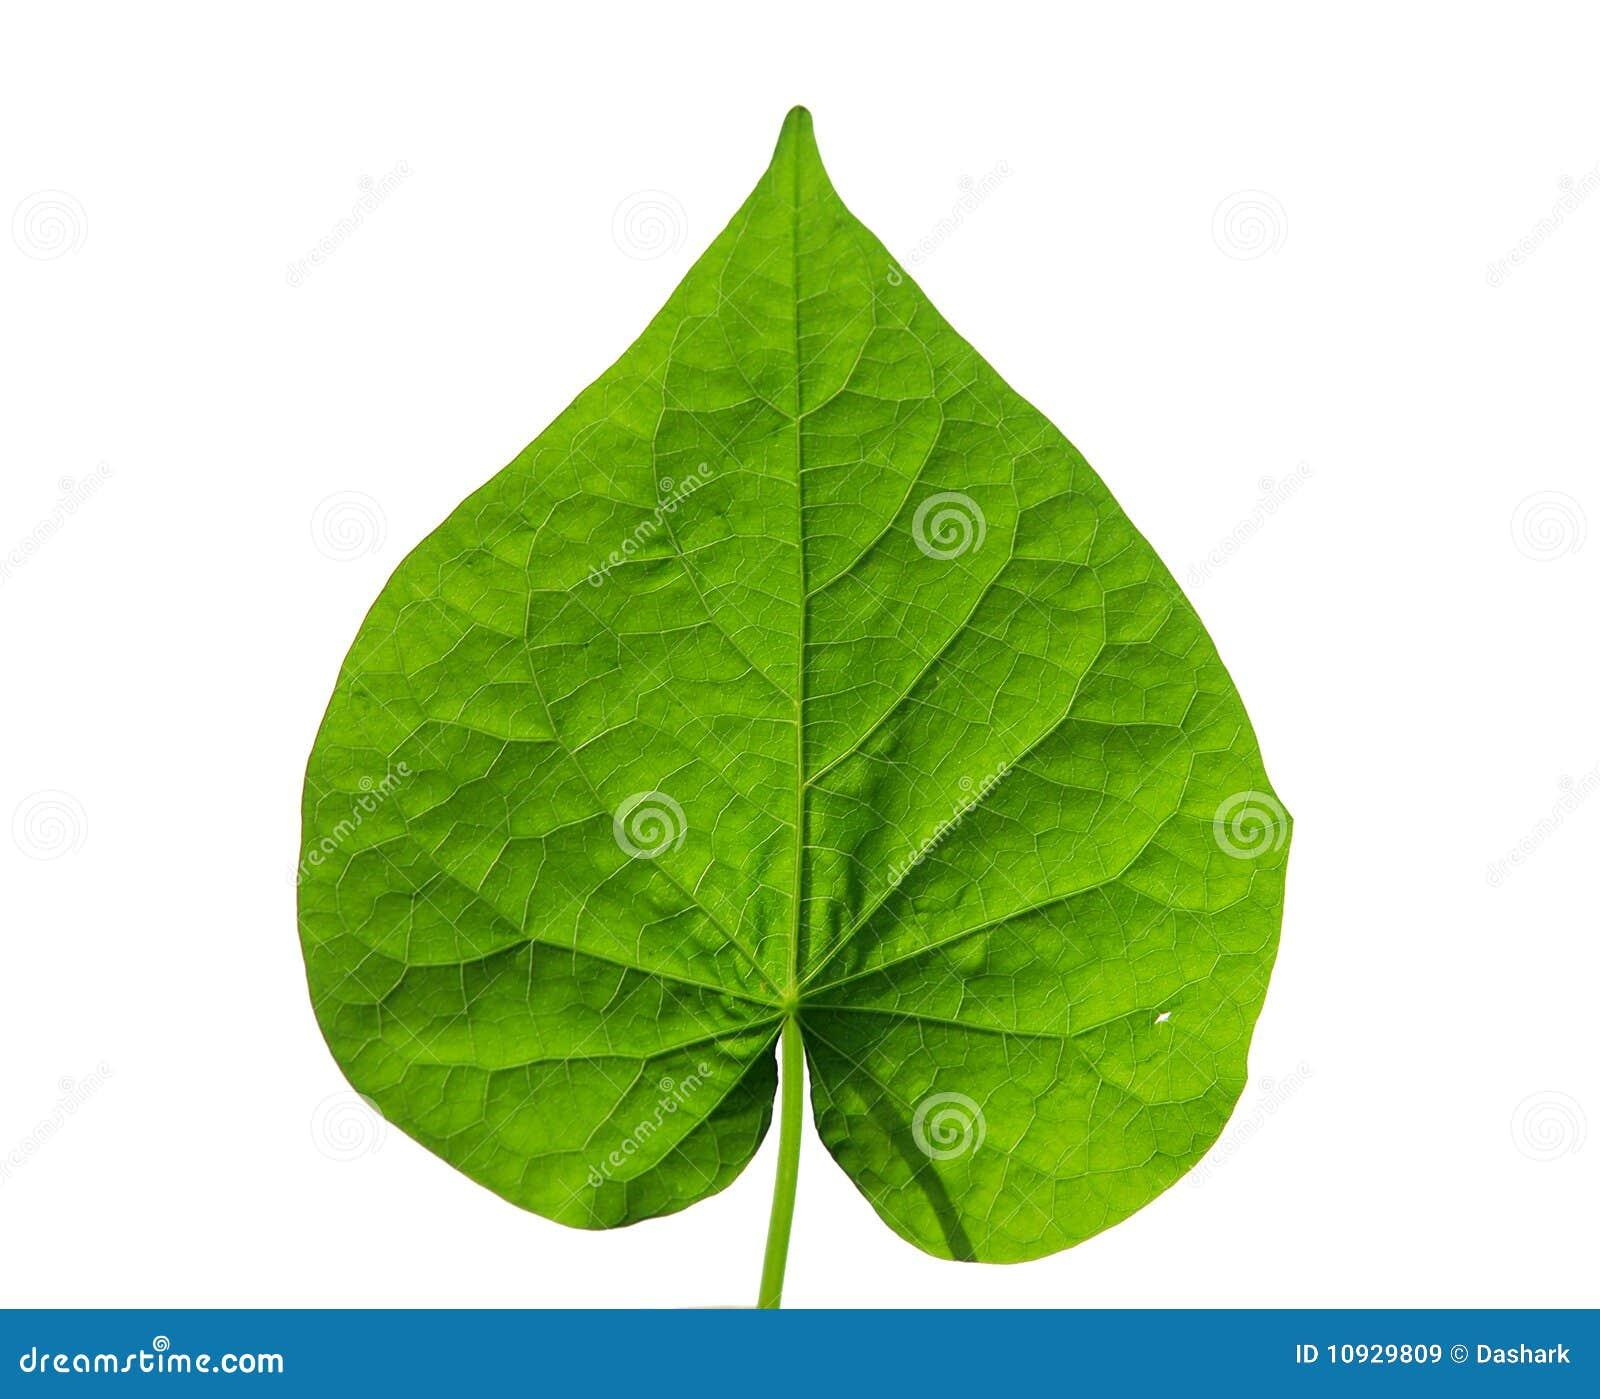 Heart shaped leaf stock image image of close concept - Plantas de hojas verdes ...